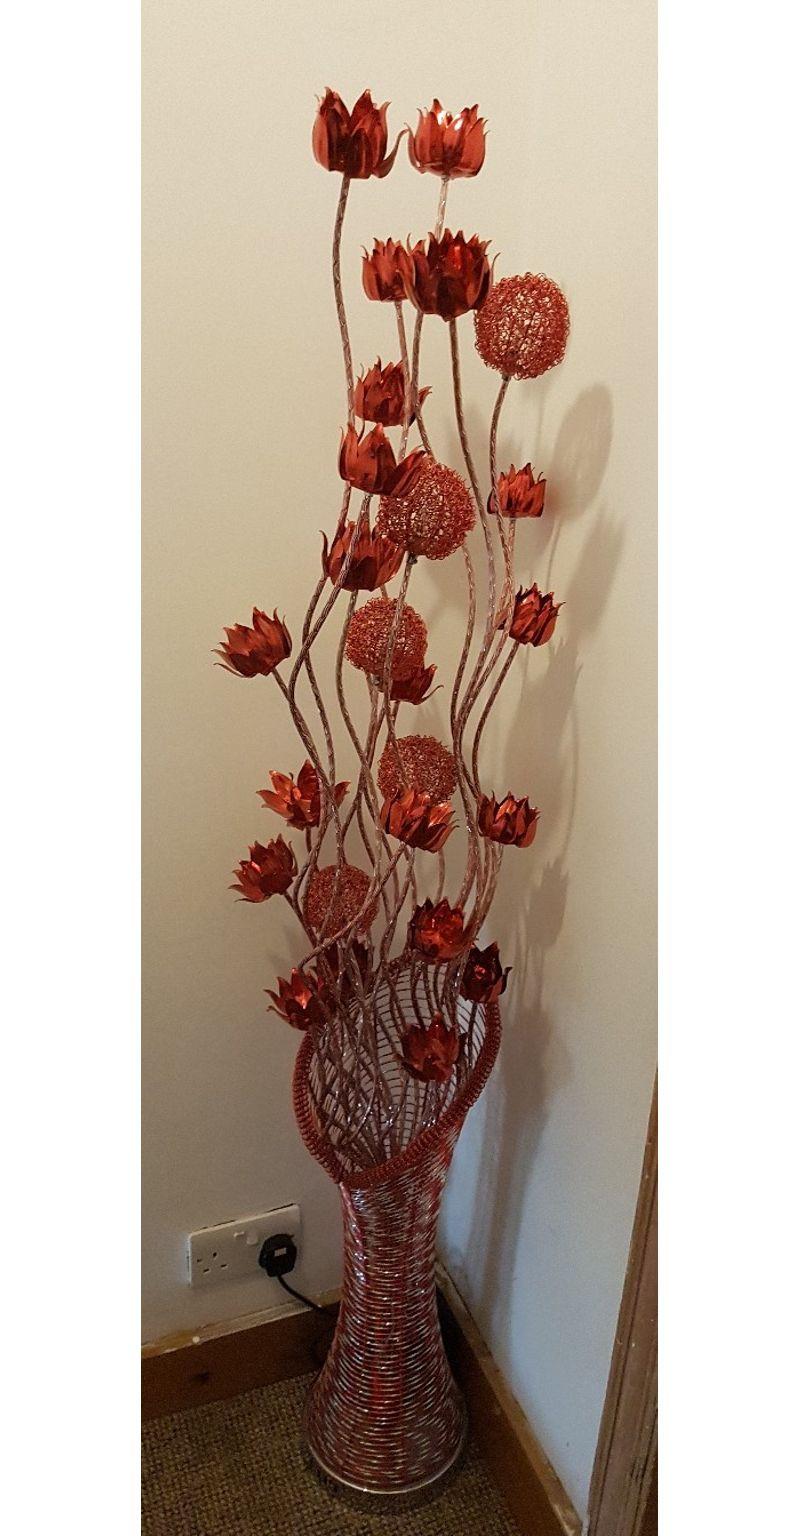 volkswagen beetle vase of https en shpock com i wxswprqxmww0ffk 2017 08 05t172440 within tall metal flower lamp